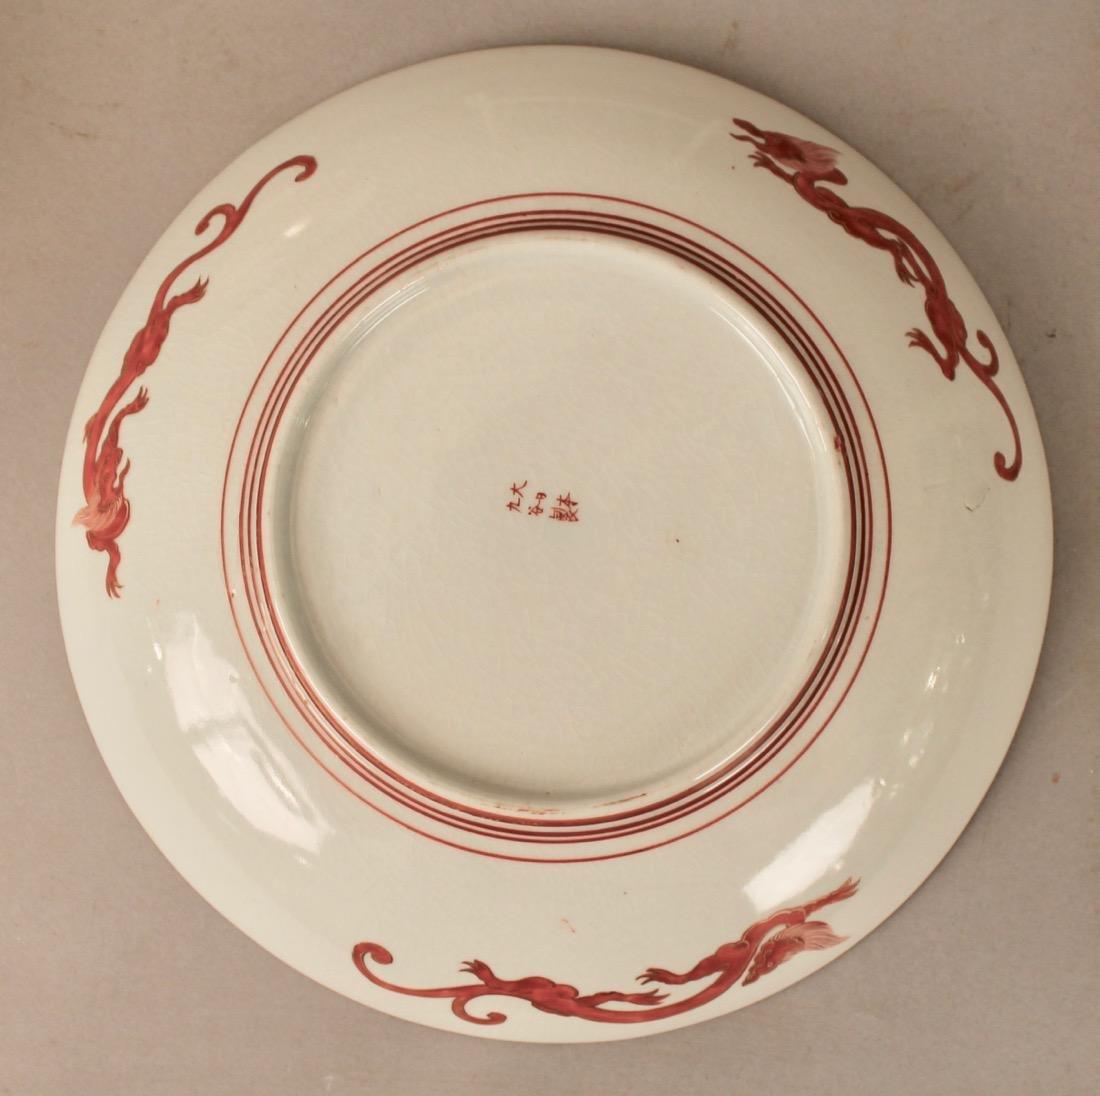 7 Chinese Phoenix Dragon Bowls - 3